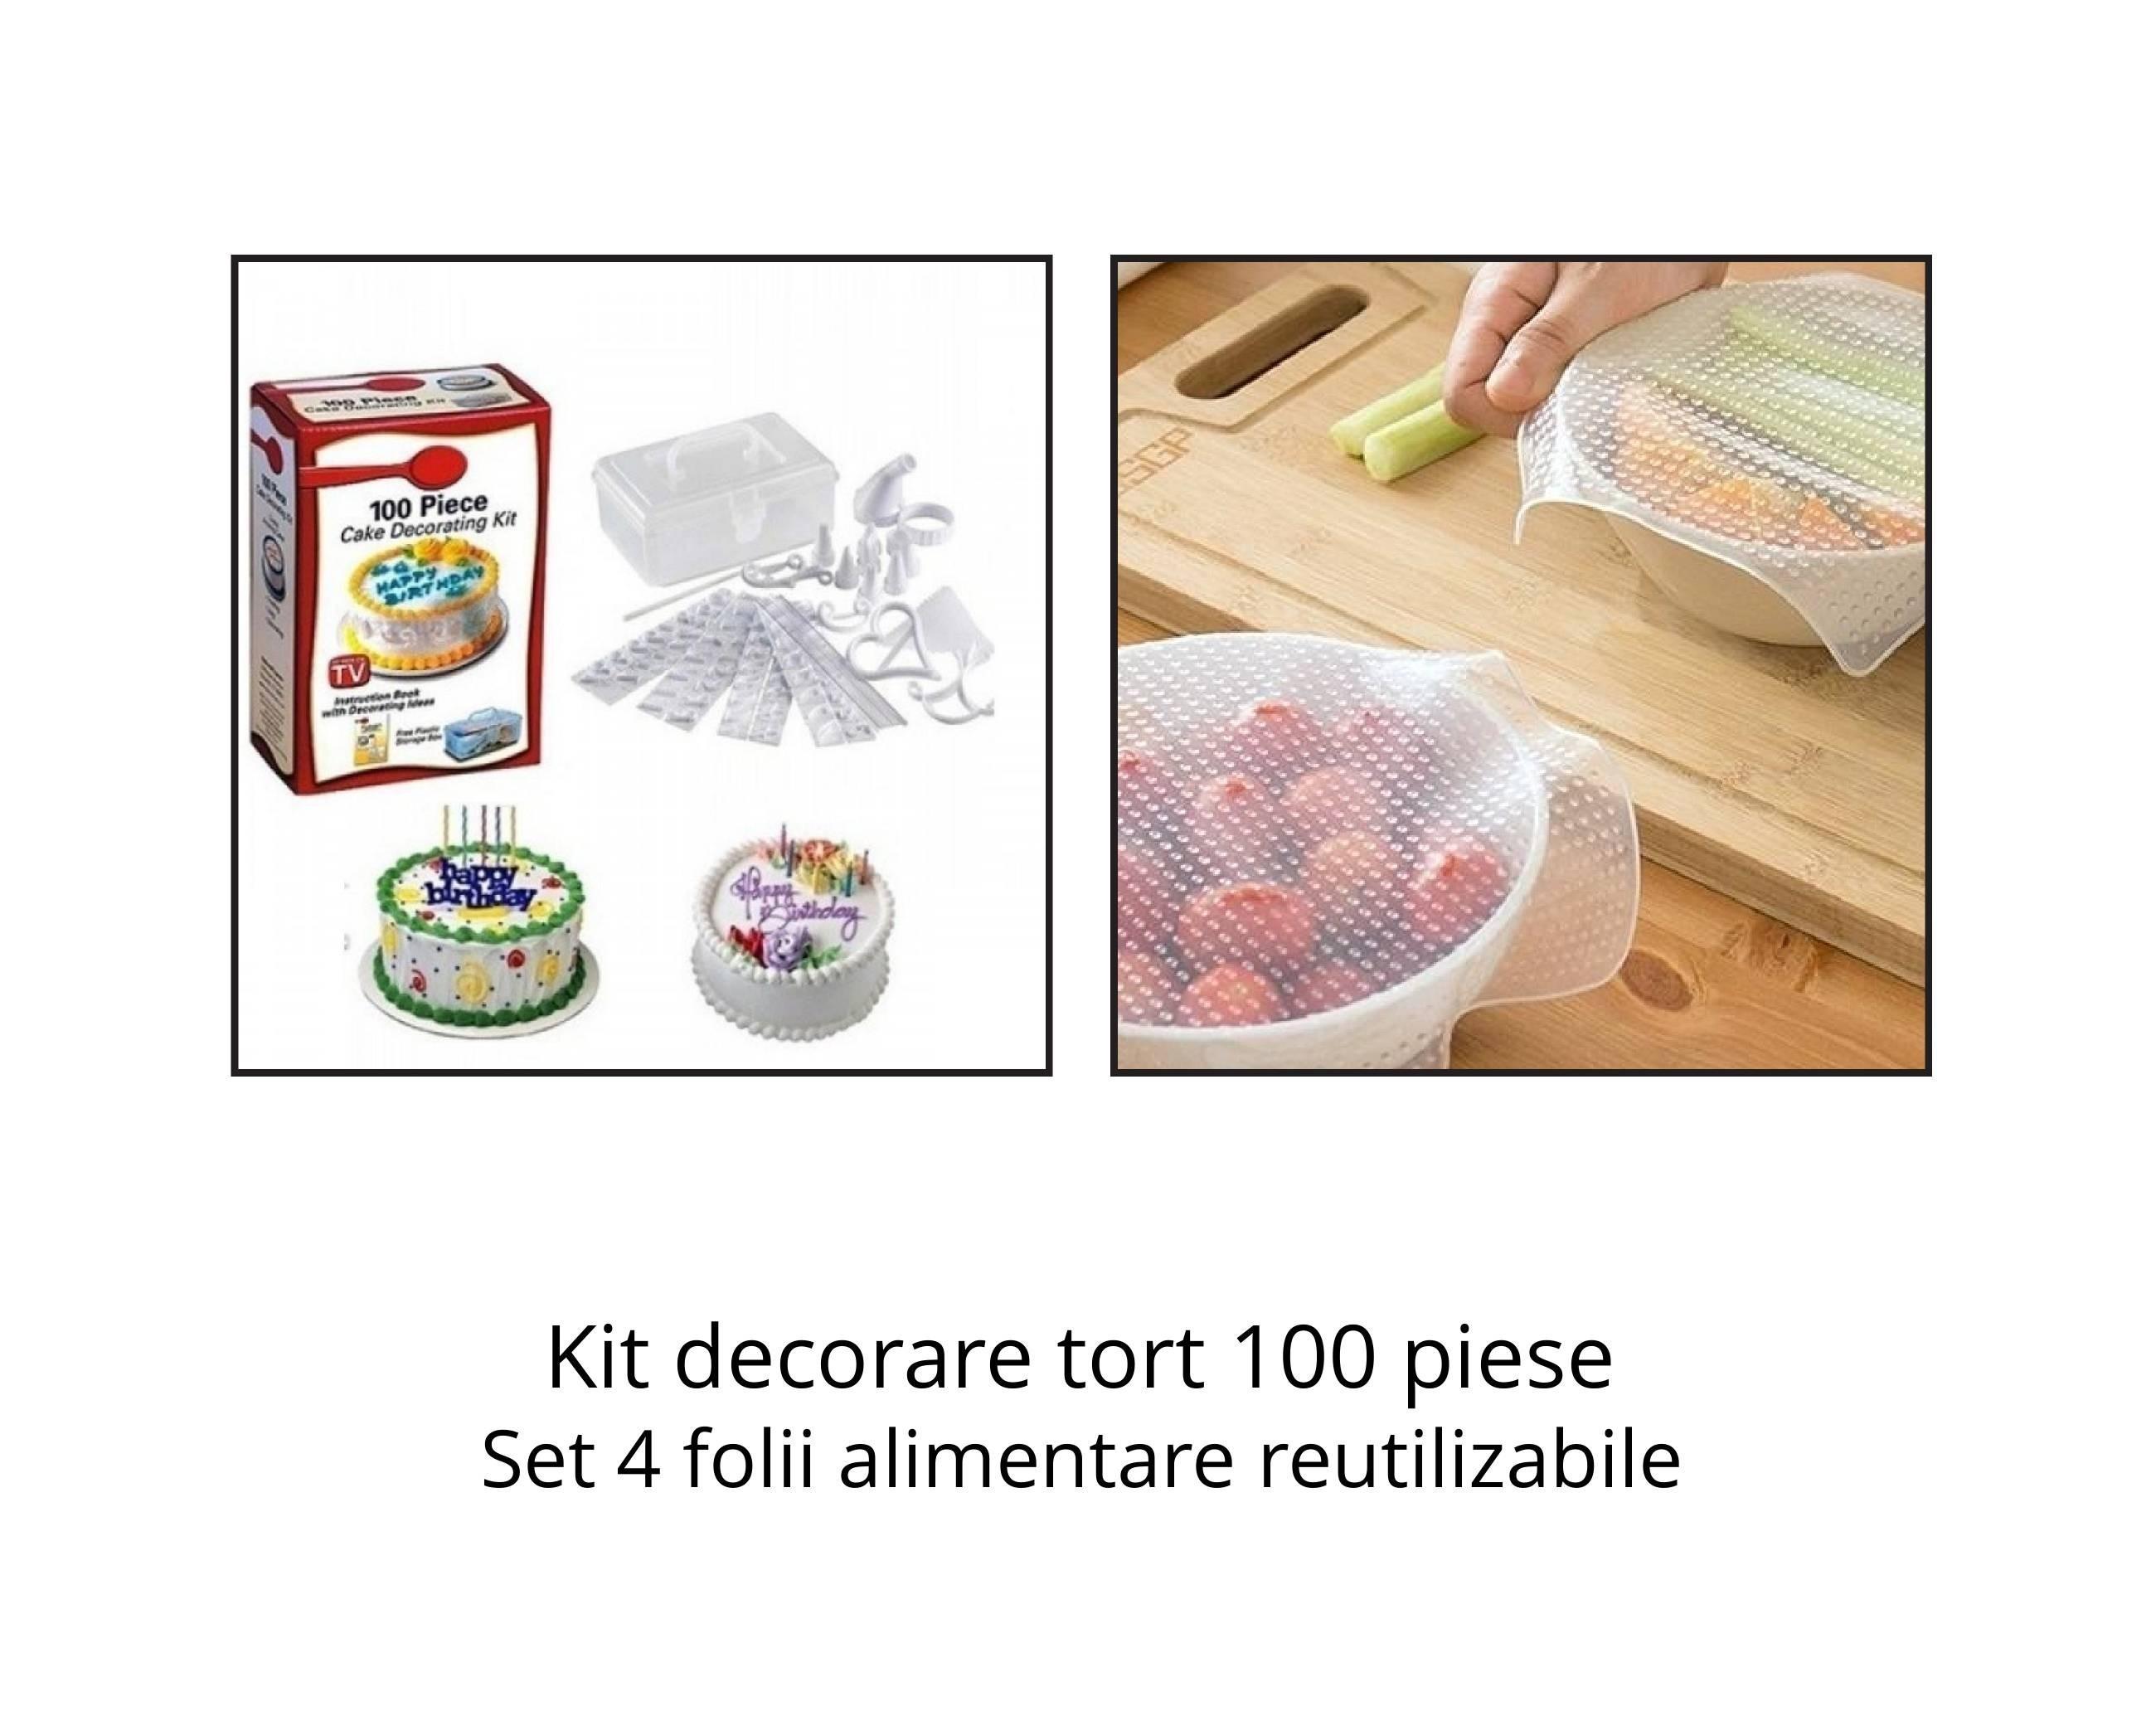 Kit decorare tort 100 piese + Set 4 folii alimentare reutilizabile imagine techstar.ro 2021